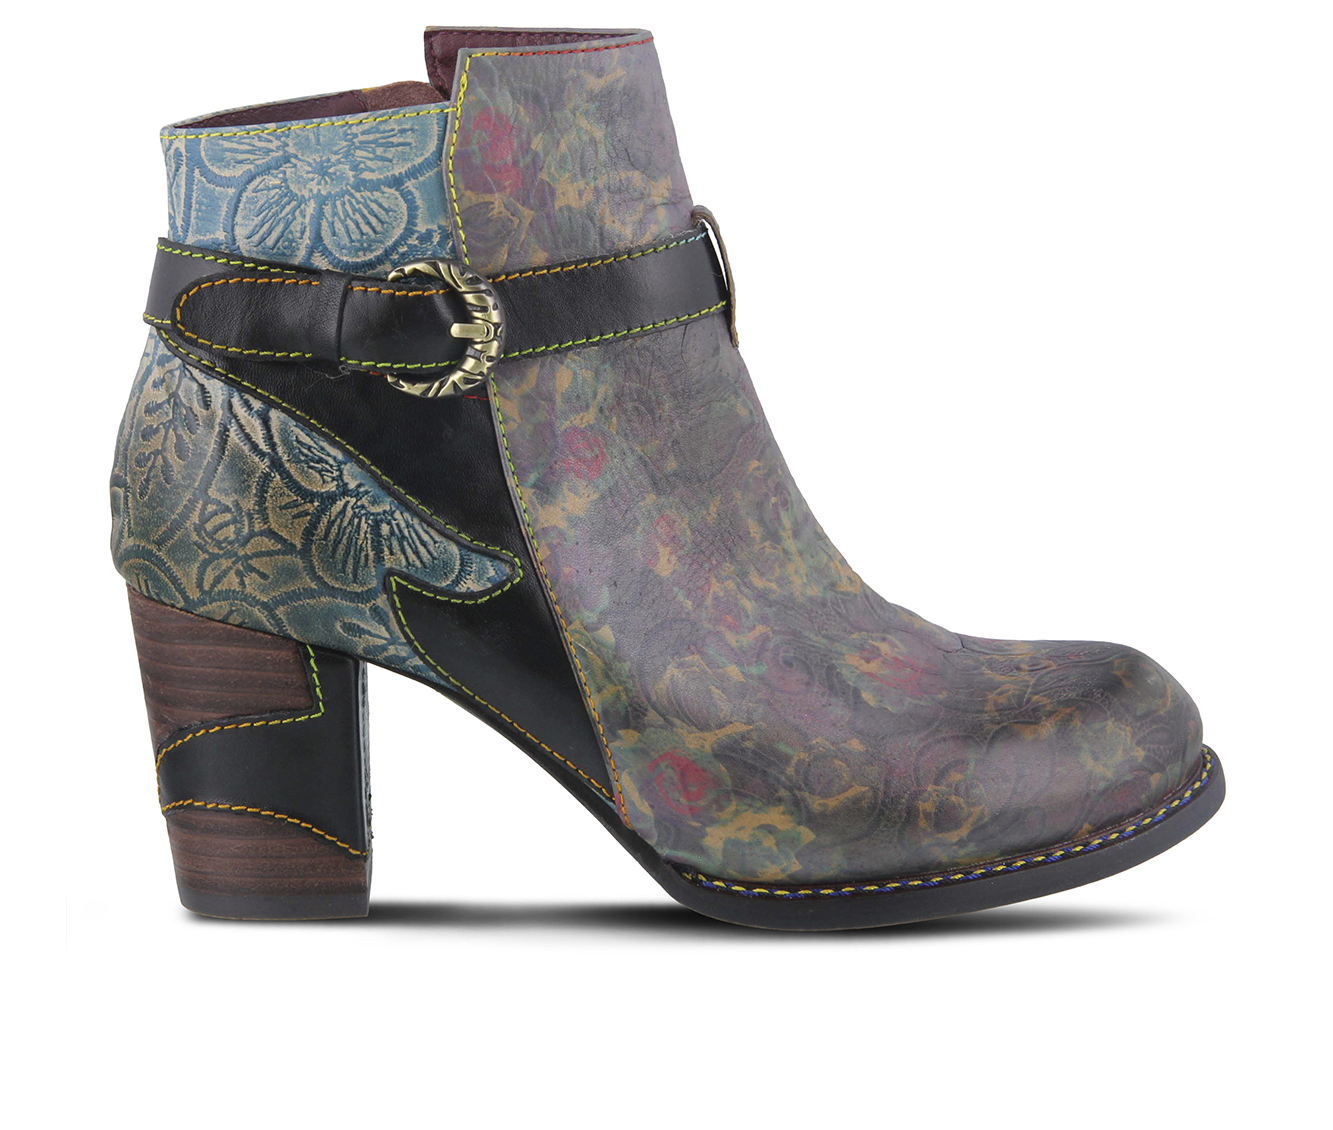 L'Artiste Tallulah Women's Boots (Black Leather)